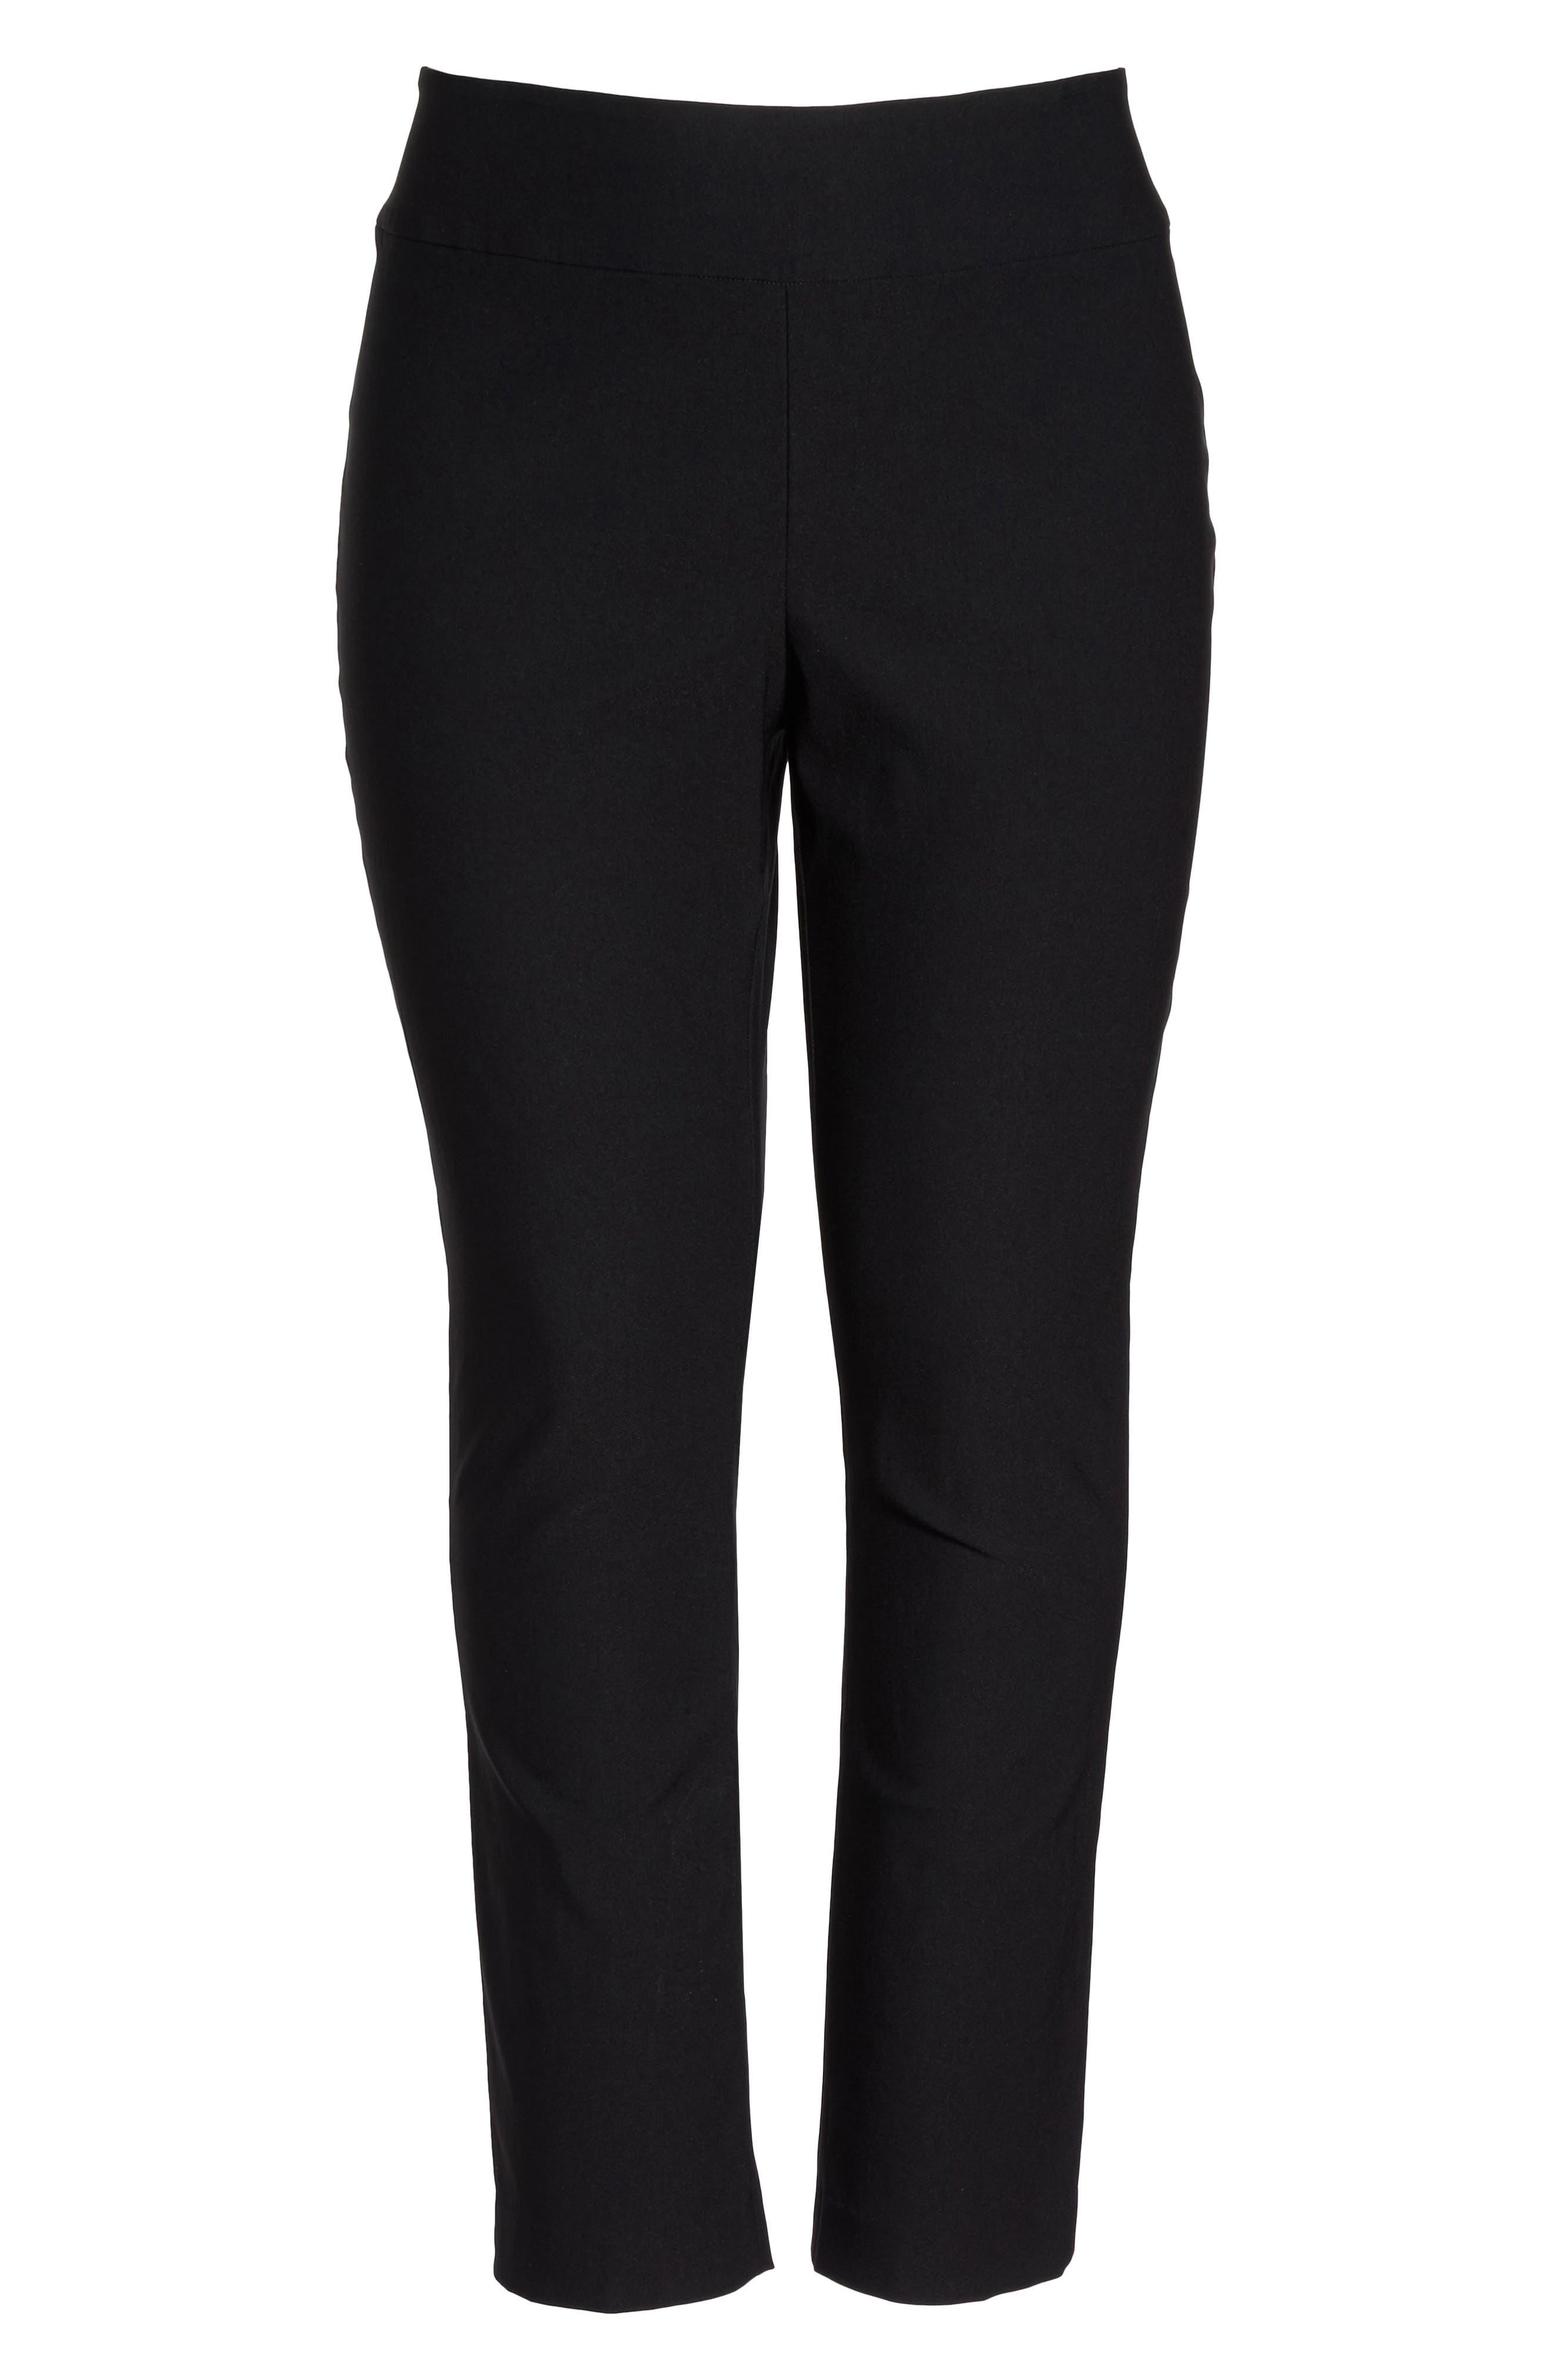 'Wonder Stretch' High Rise Straight Leg Pants,                         Main,                         color, BLACK ONYX